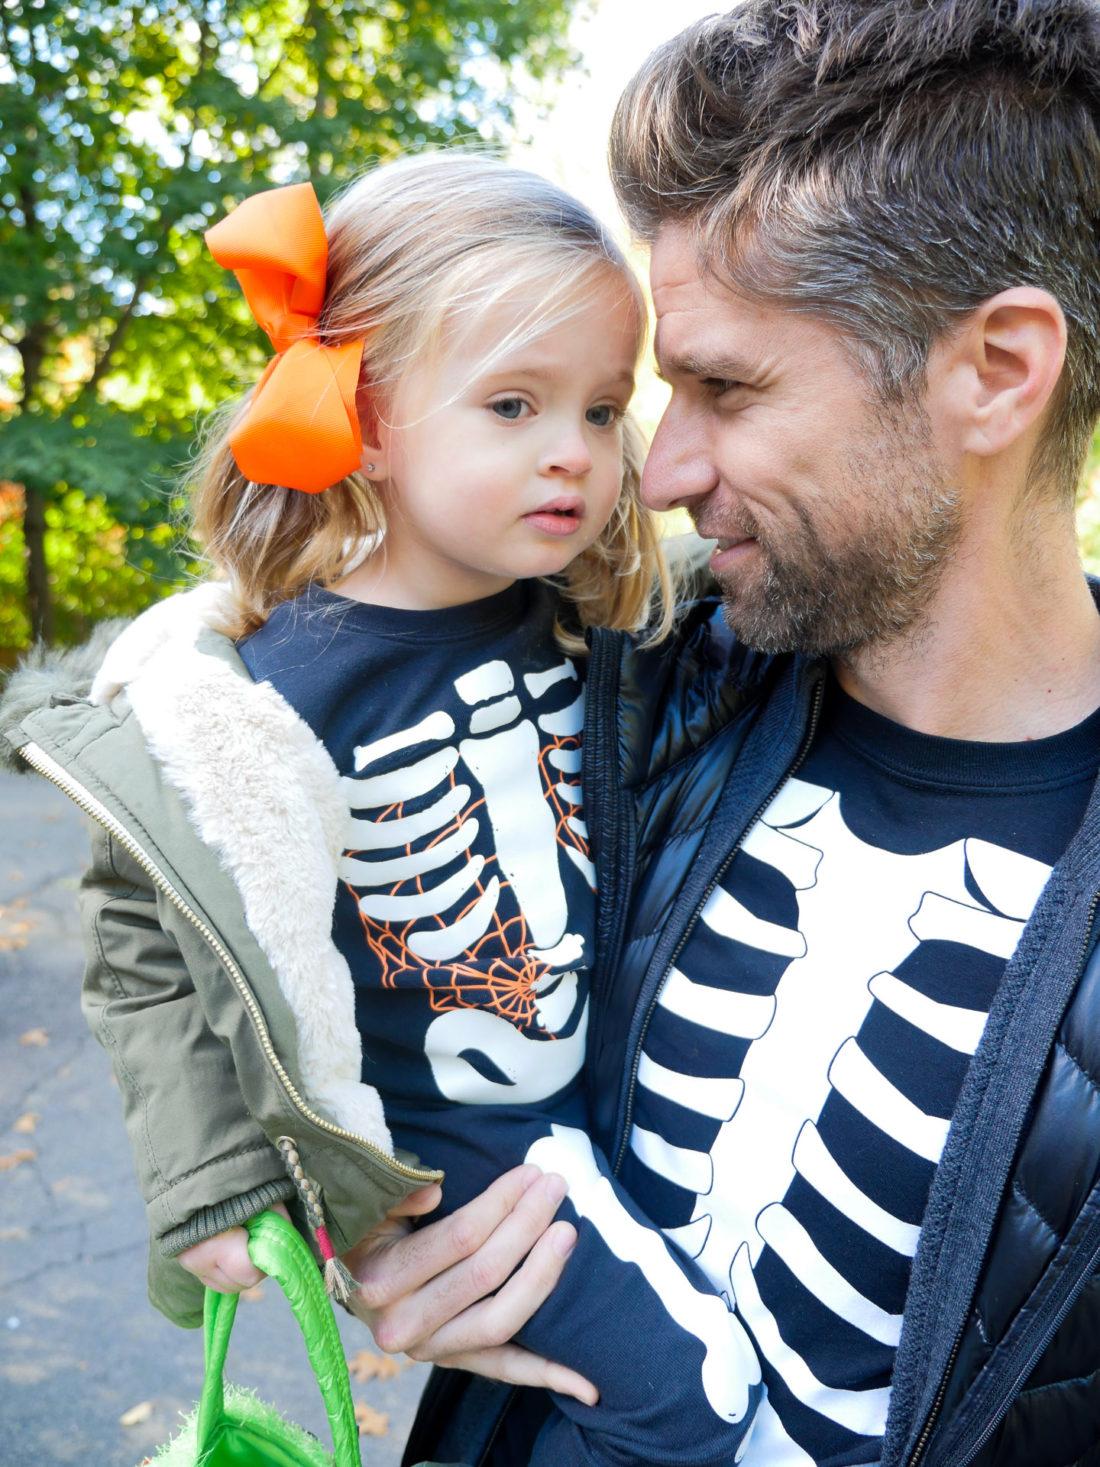 Kyle Martino and Marlowe Martino dressed up as skeletons on halloween